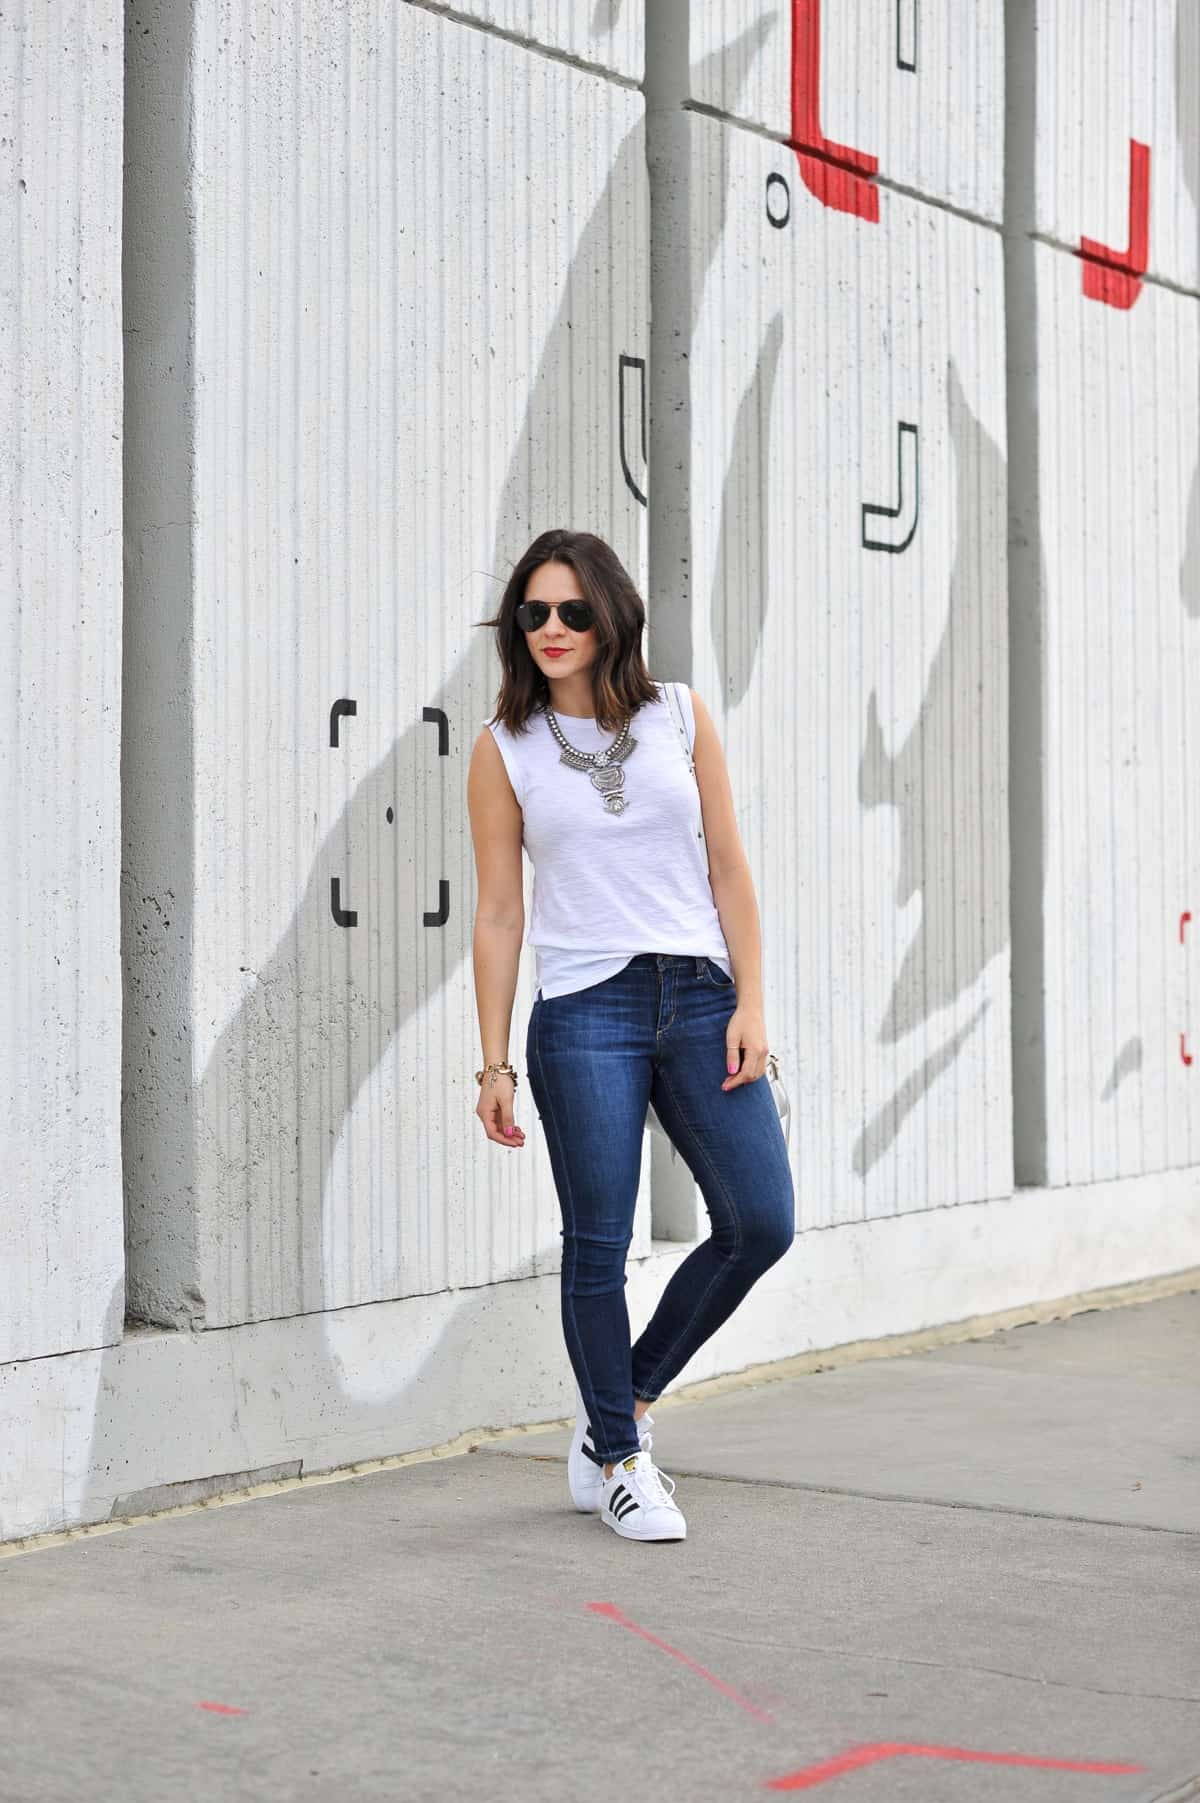 adidas originals, street style, My Style Vita - @mystylevita - 3